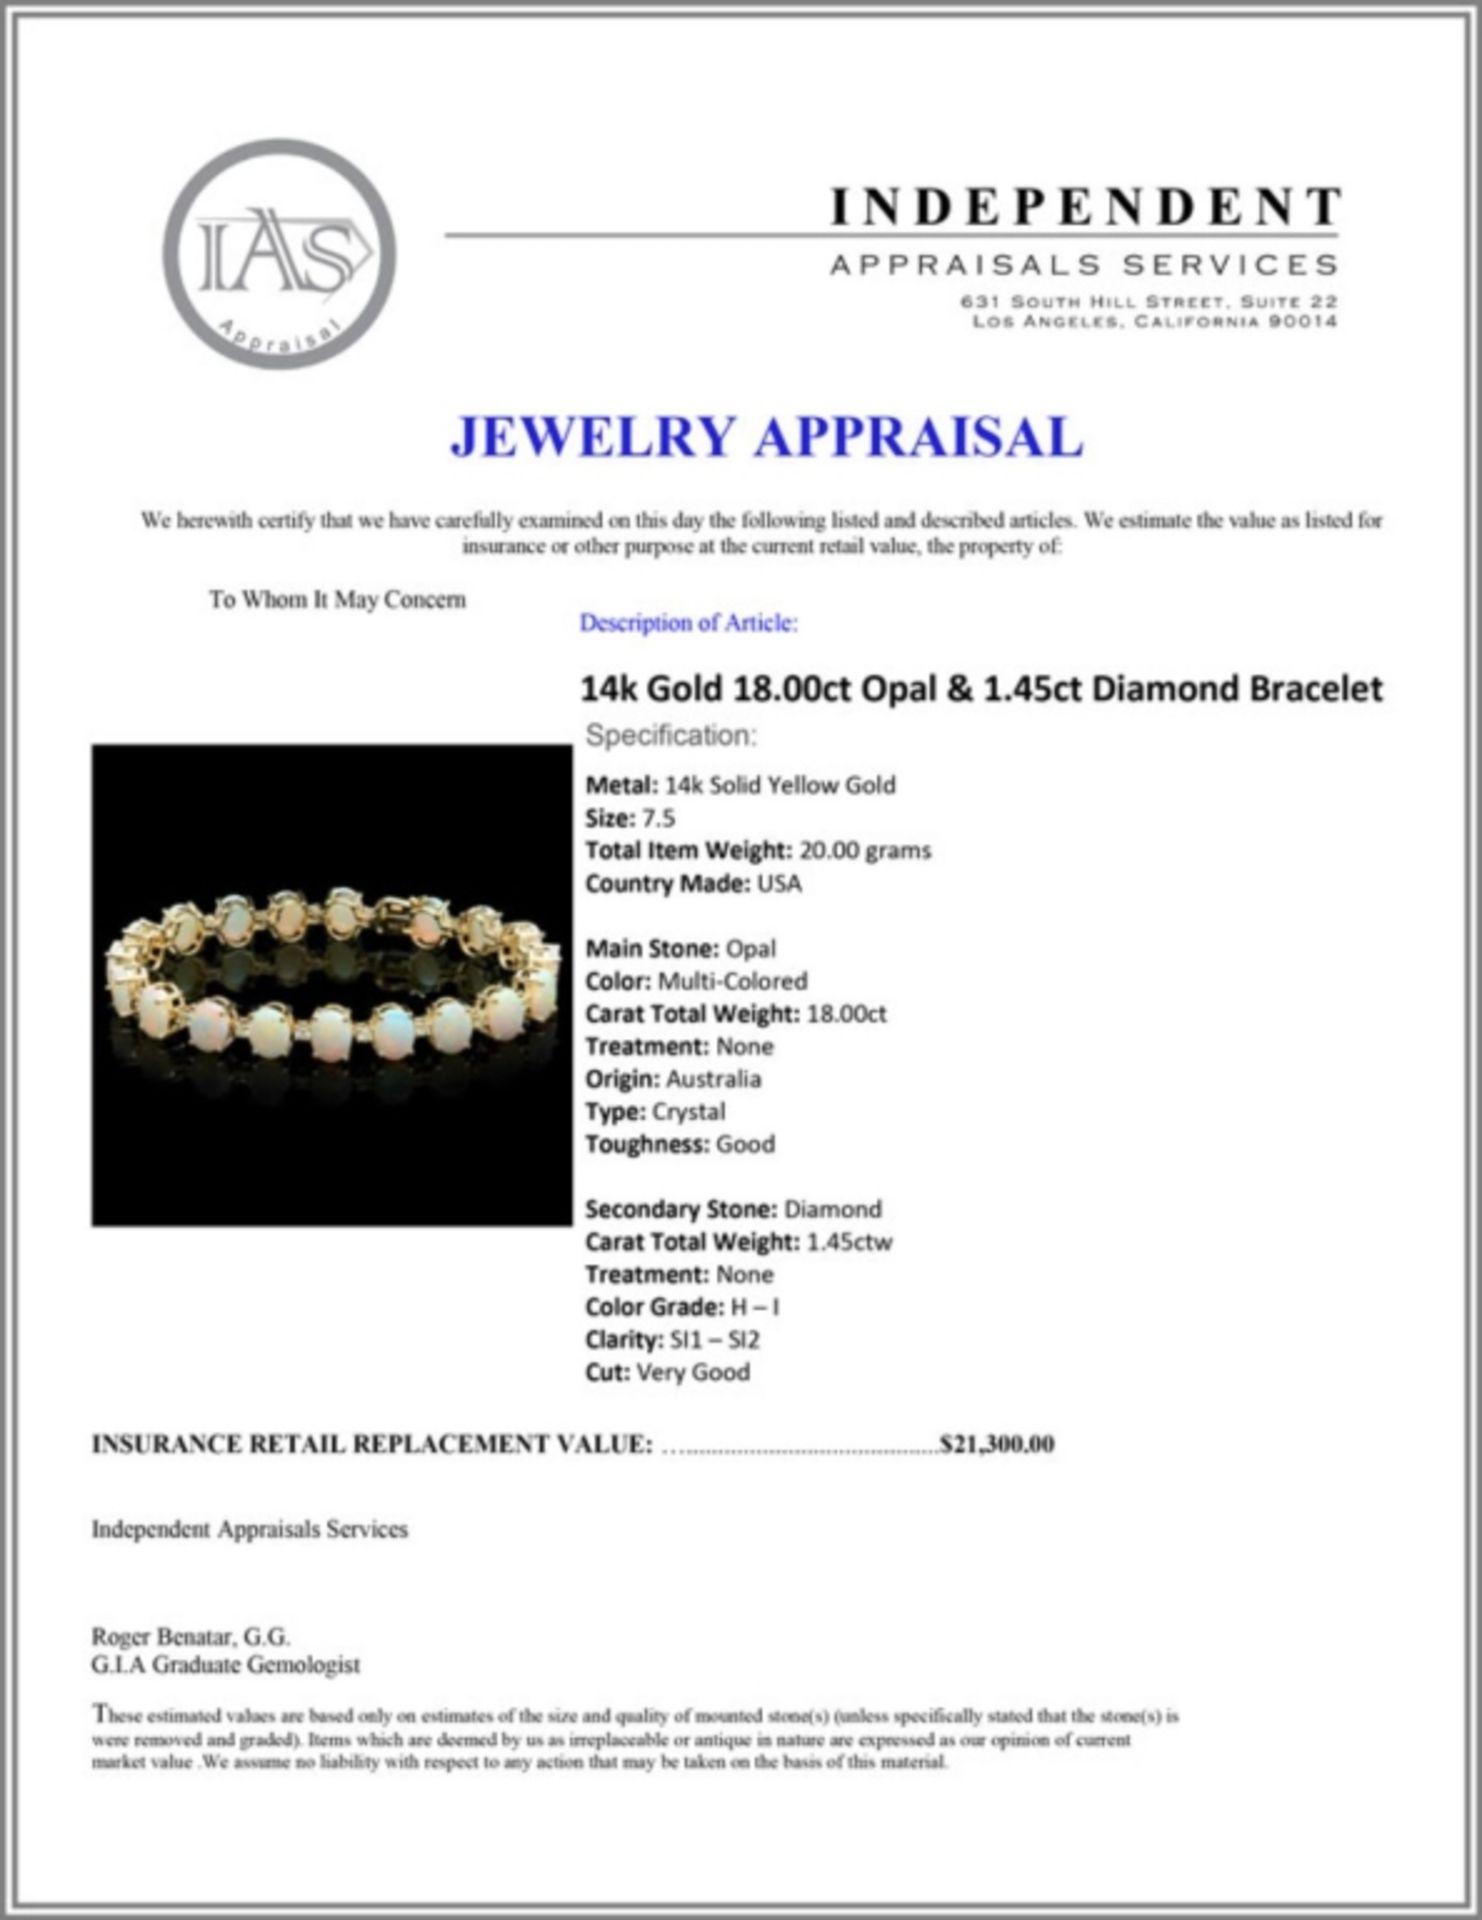 `14k Gold 18.00ct Opal & 1.45ct Diamond Bracelet - Image 3 of 3